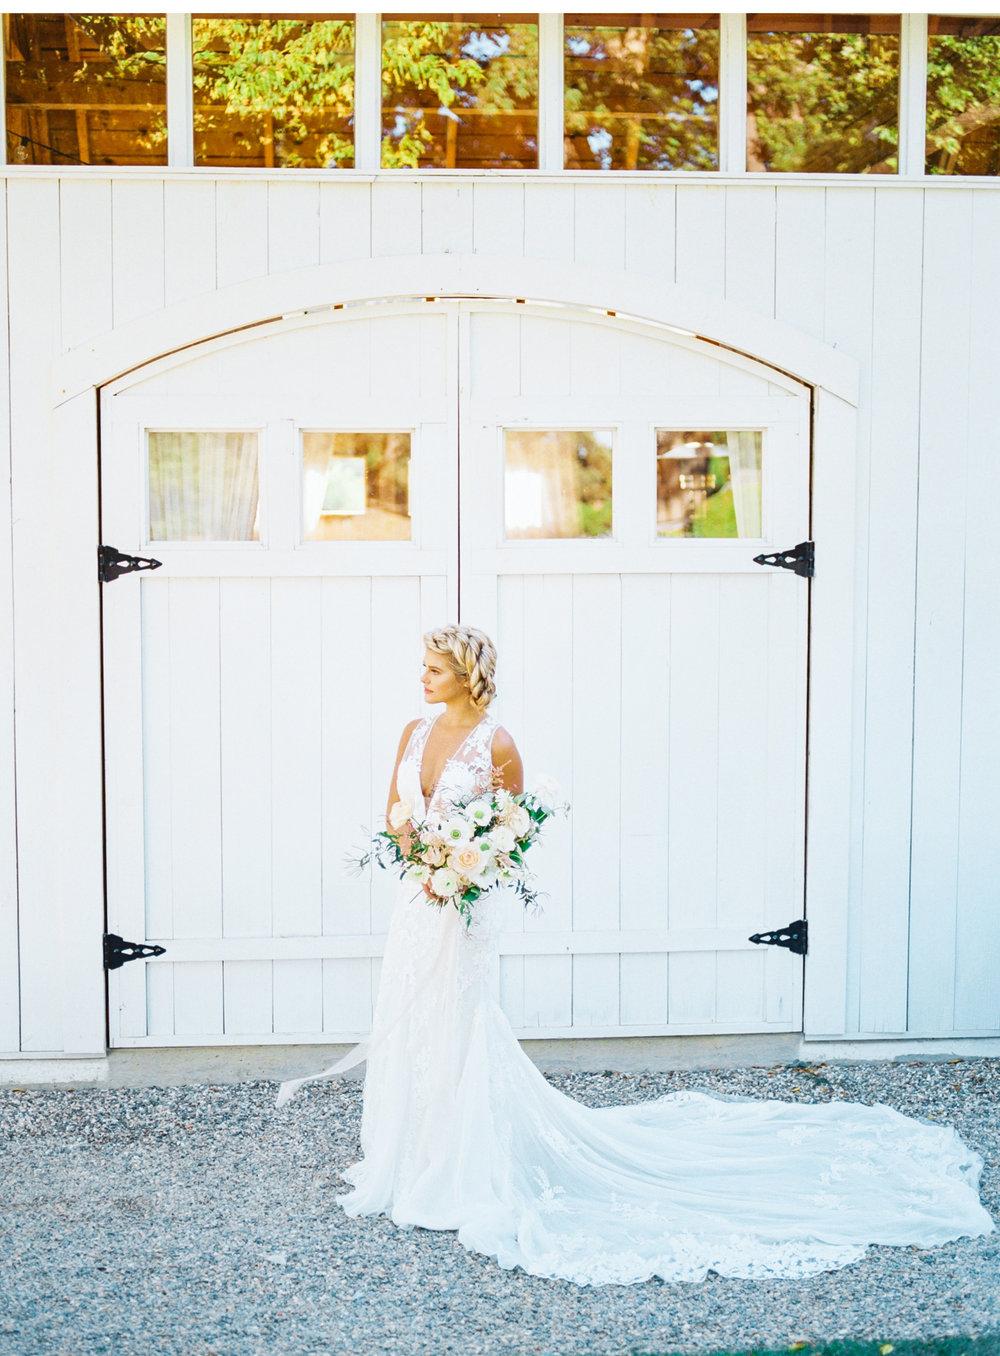 Southern-California-Wedding-Natalie-Schutt-Photography_08.jpg